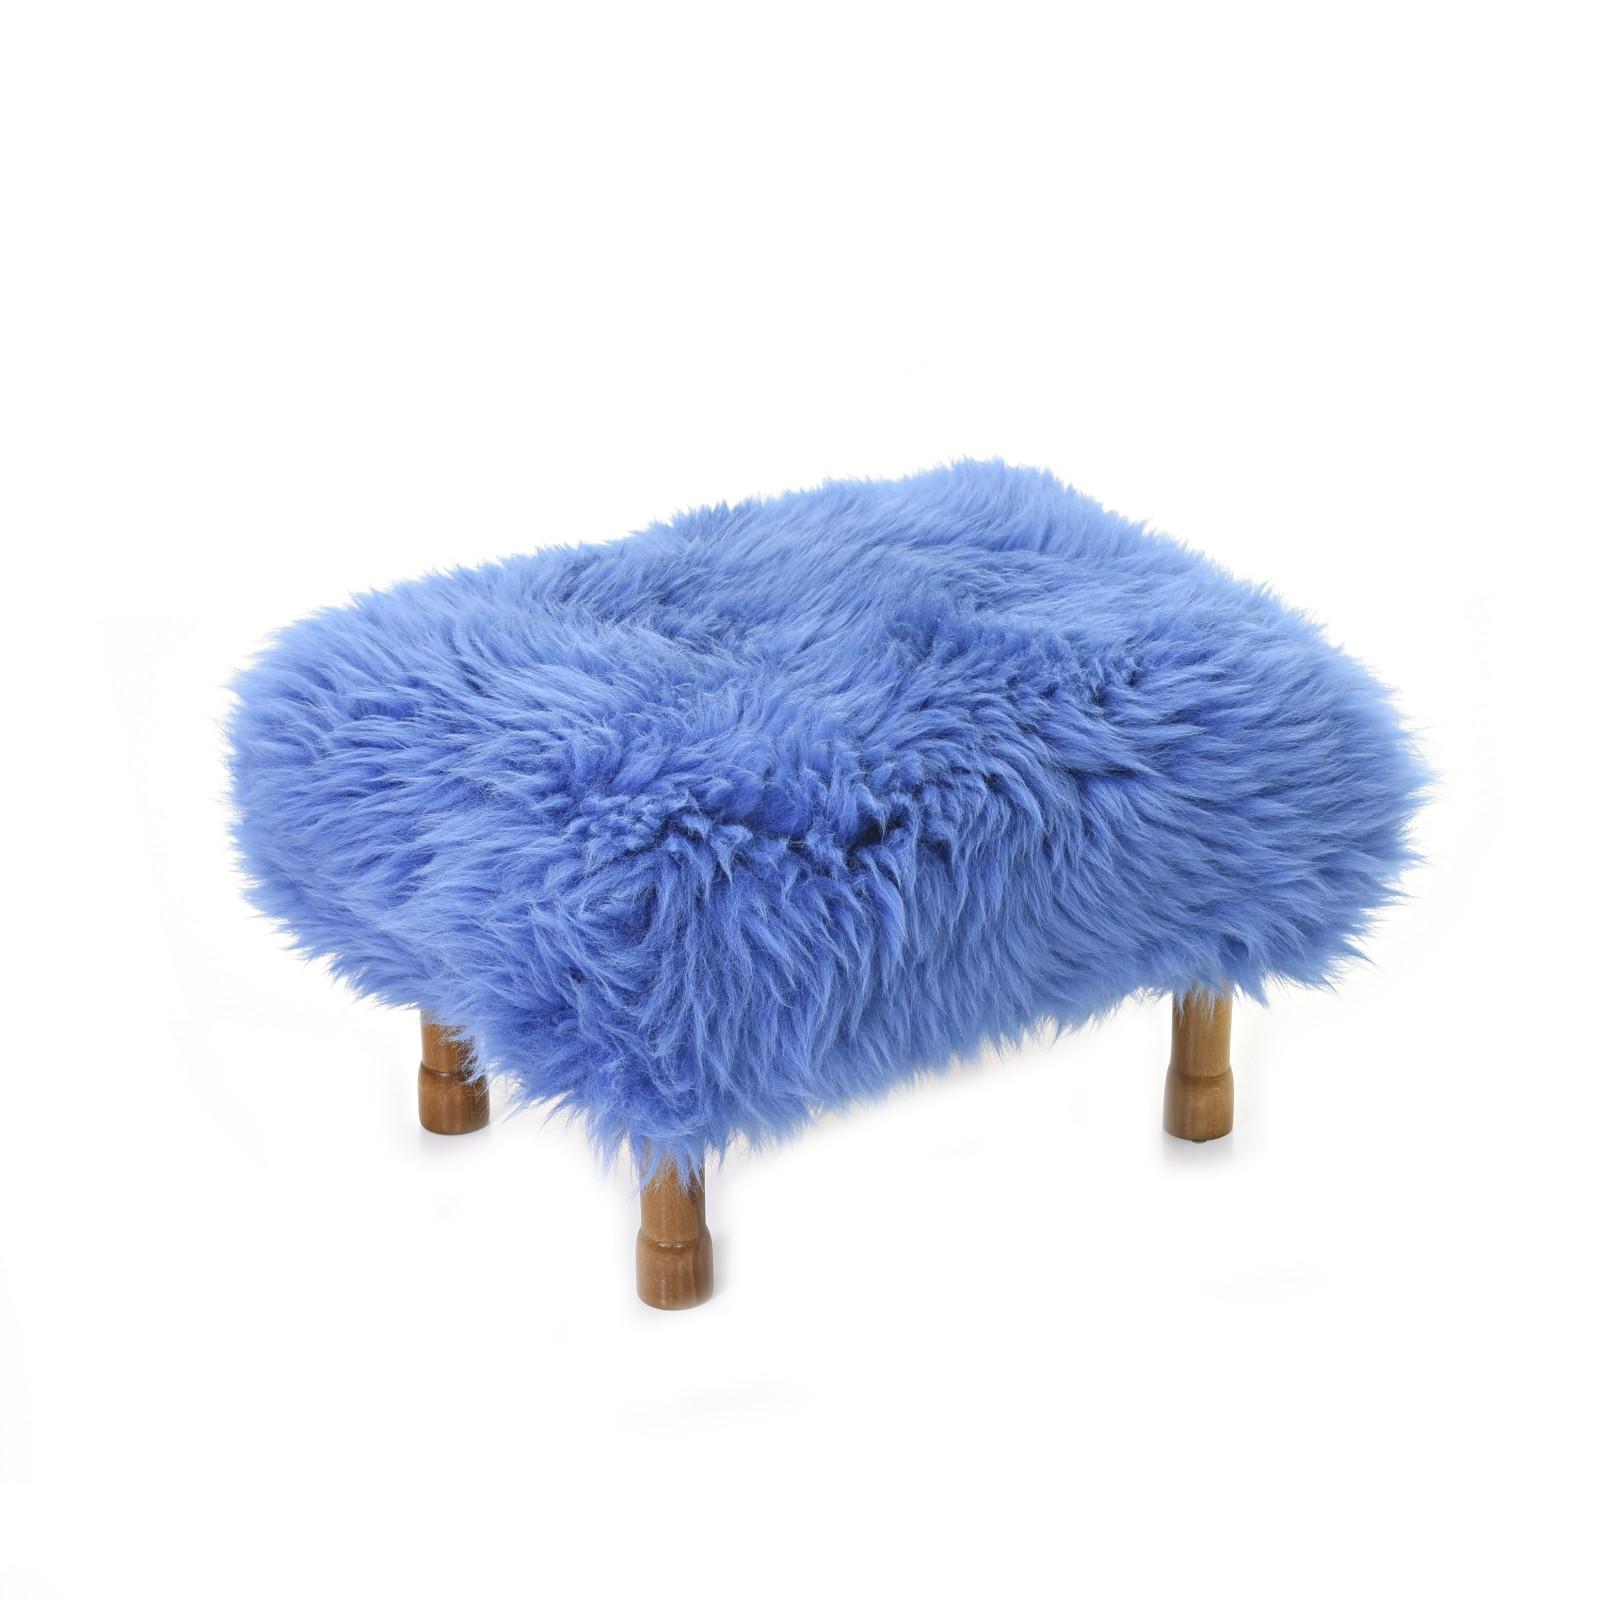 Delyth Sheepskin Footstool Cornflower Blue